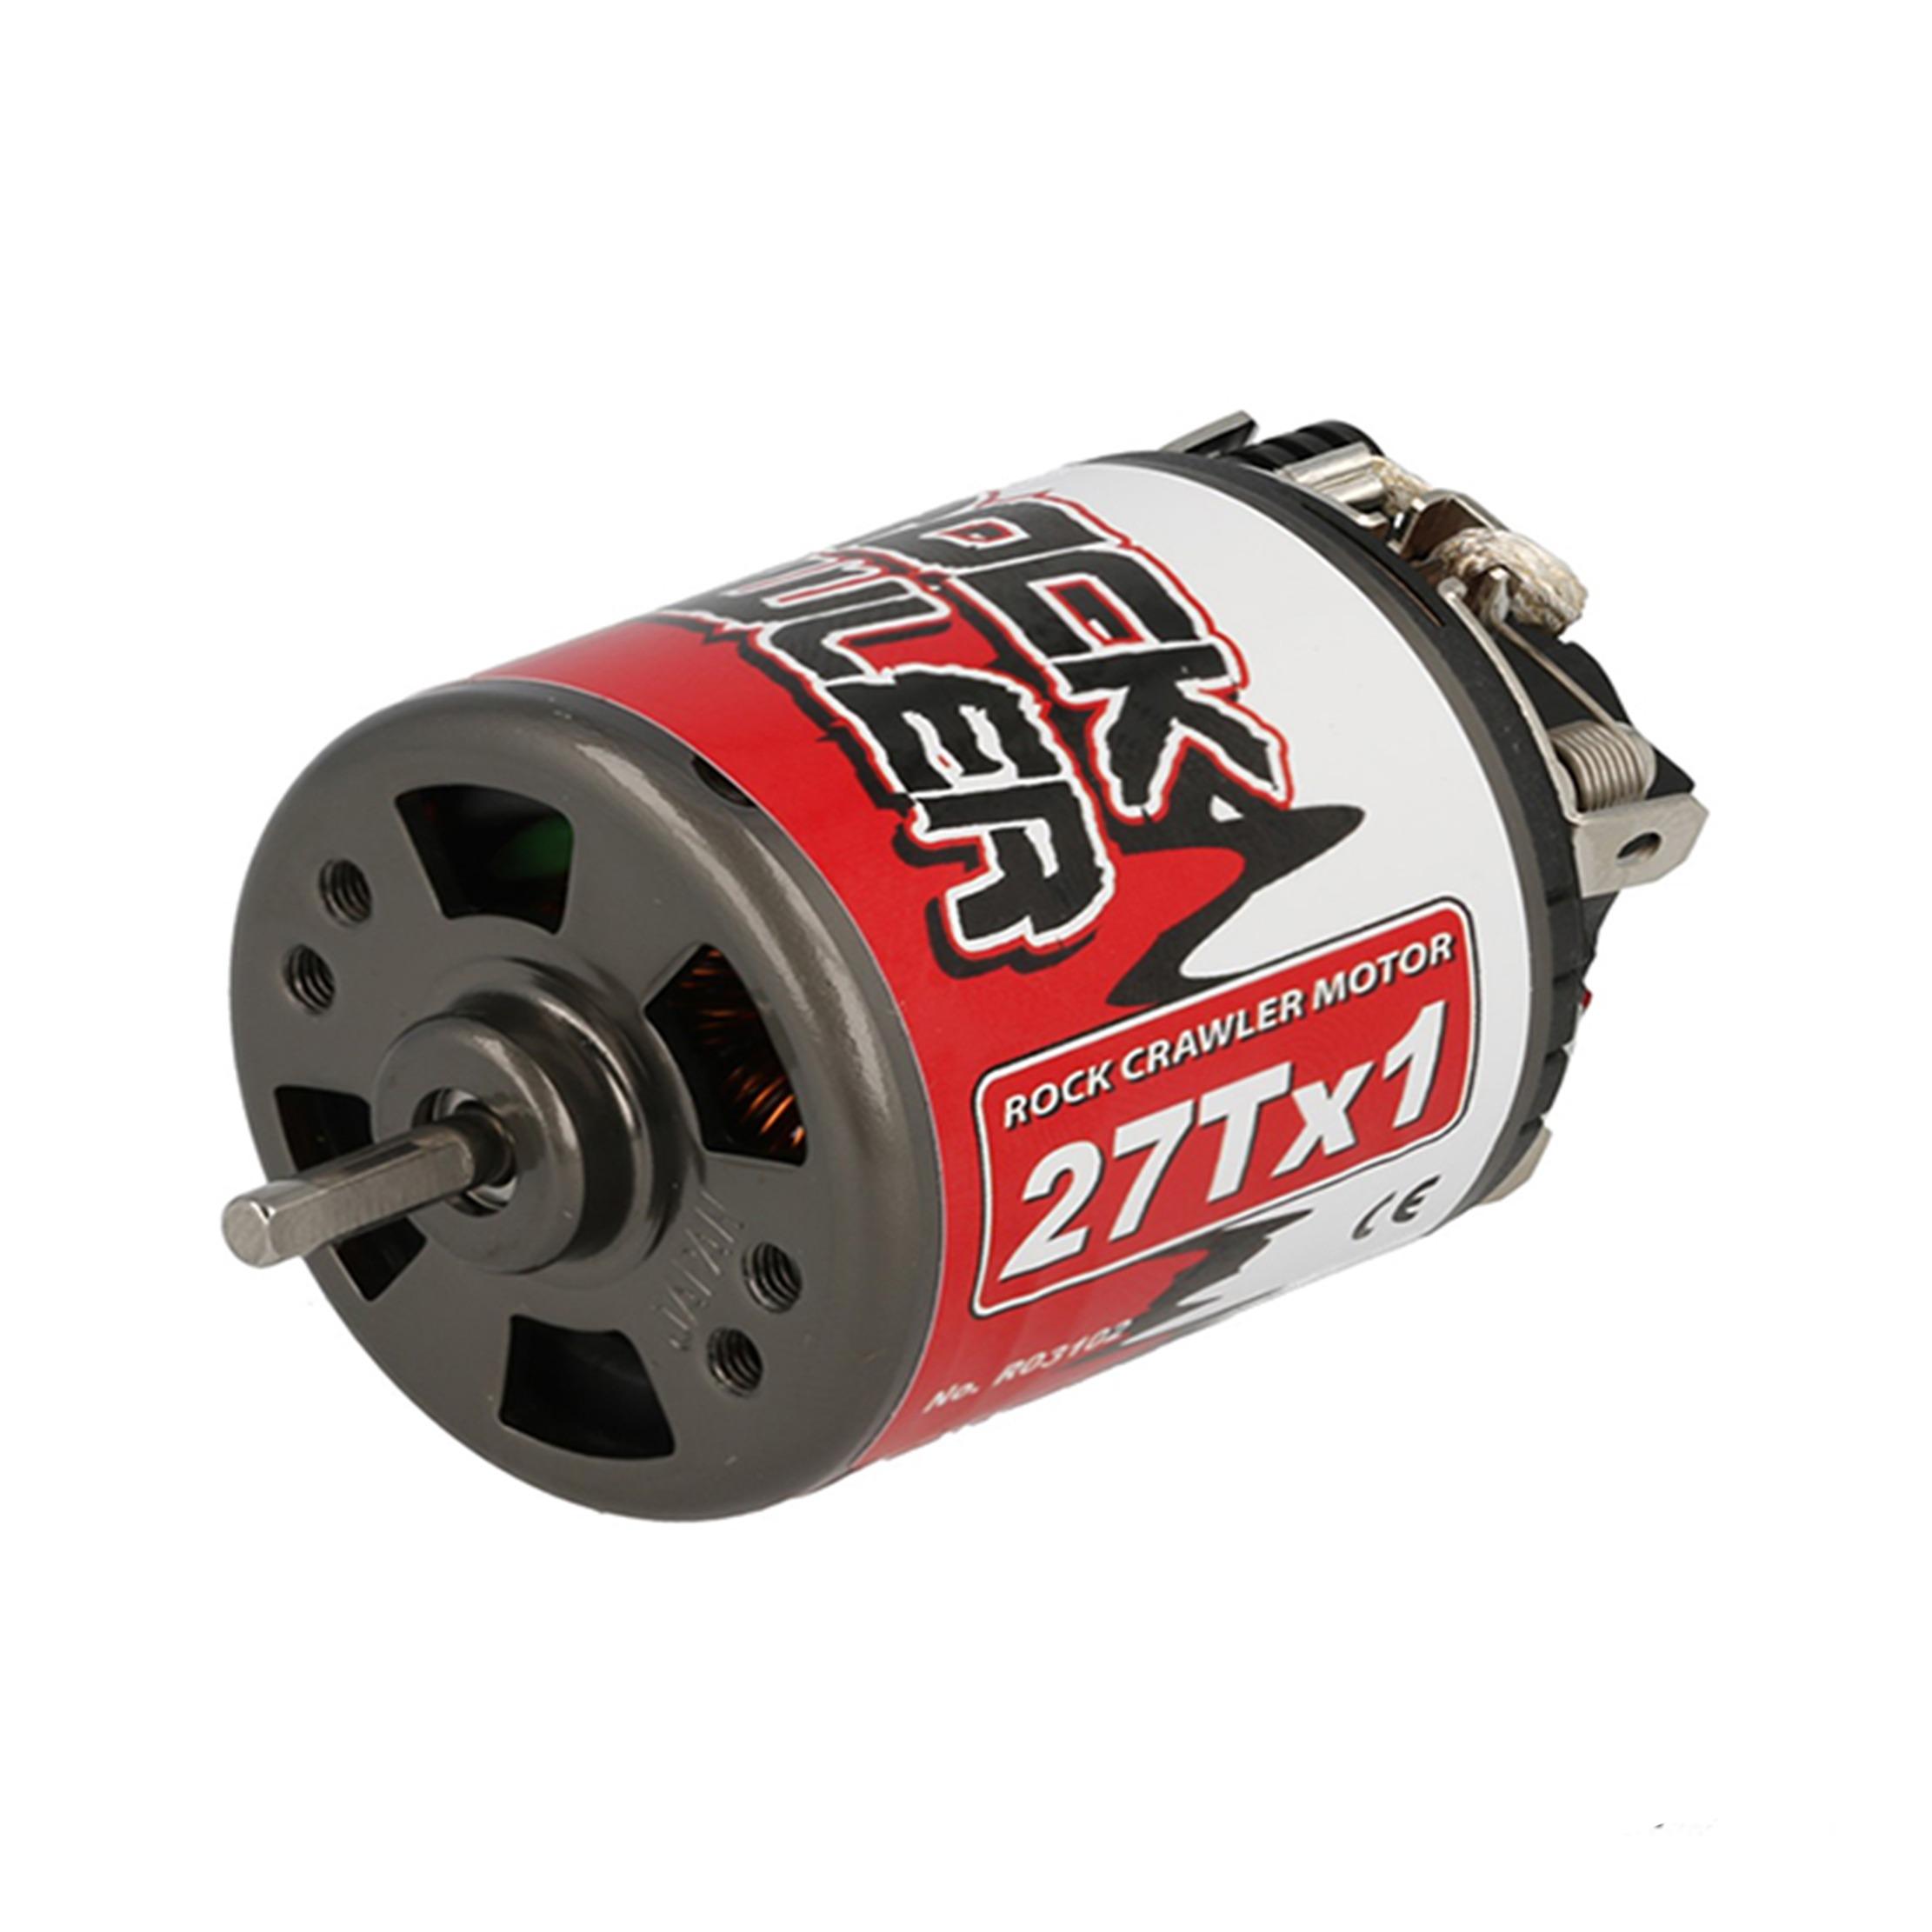 Motor Robitronic Rock Crawler 27 vueltas